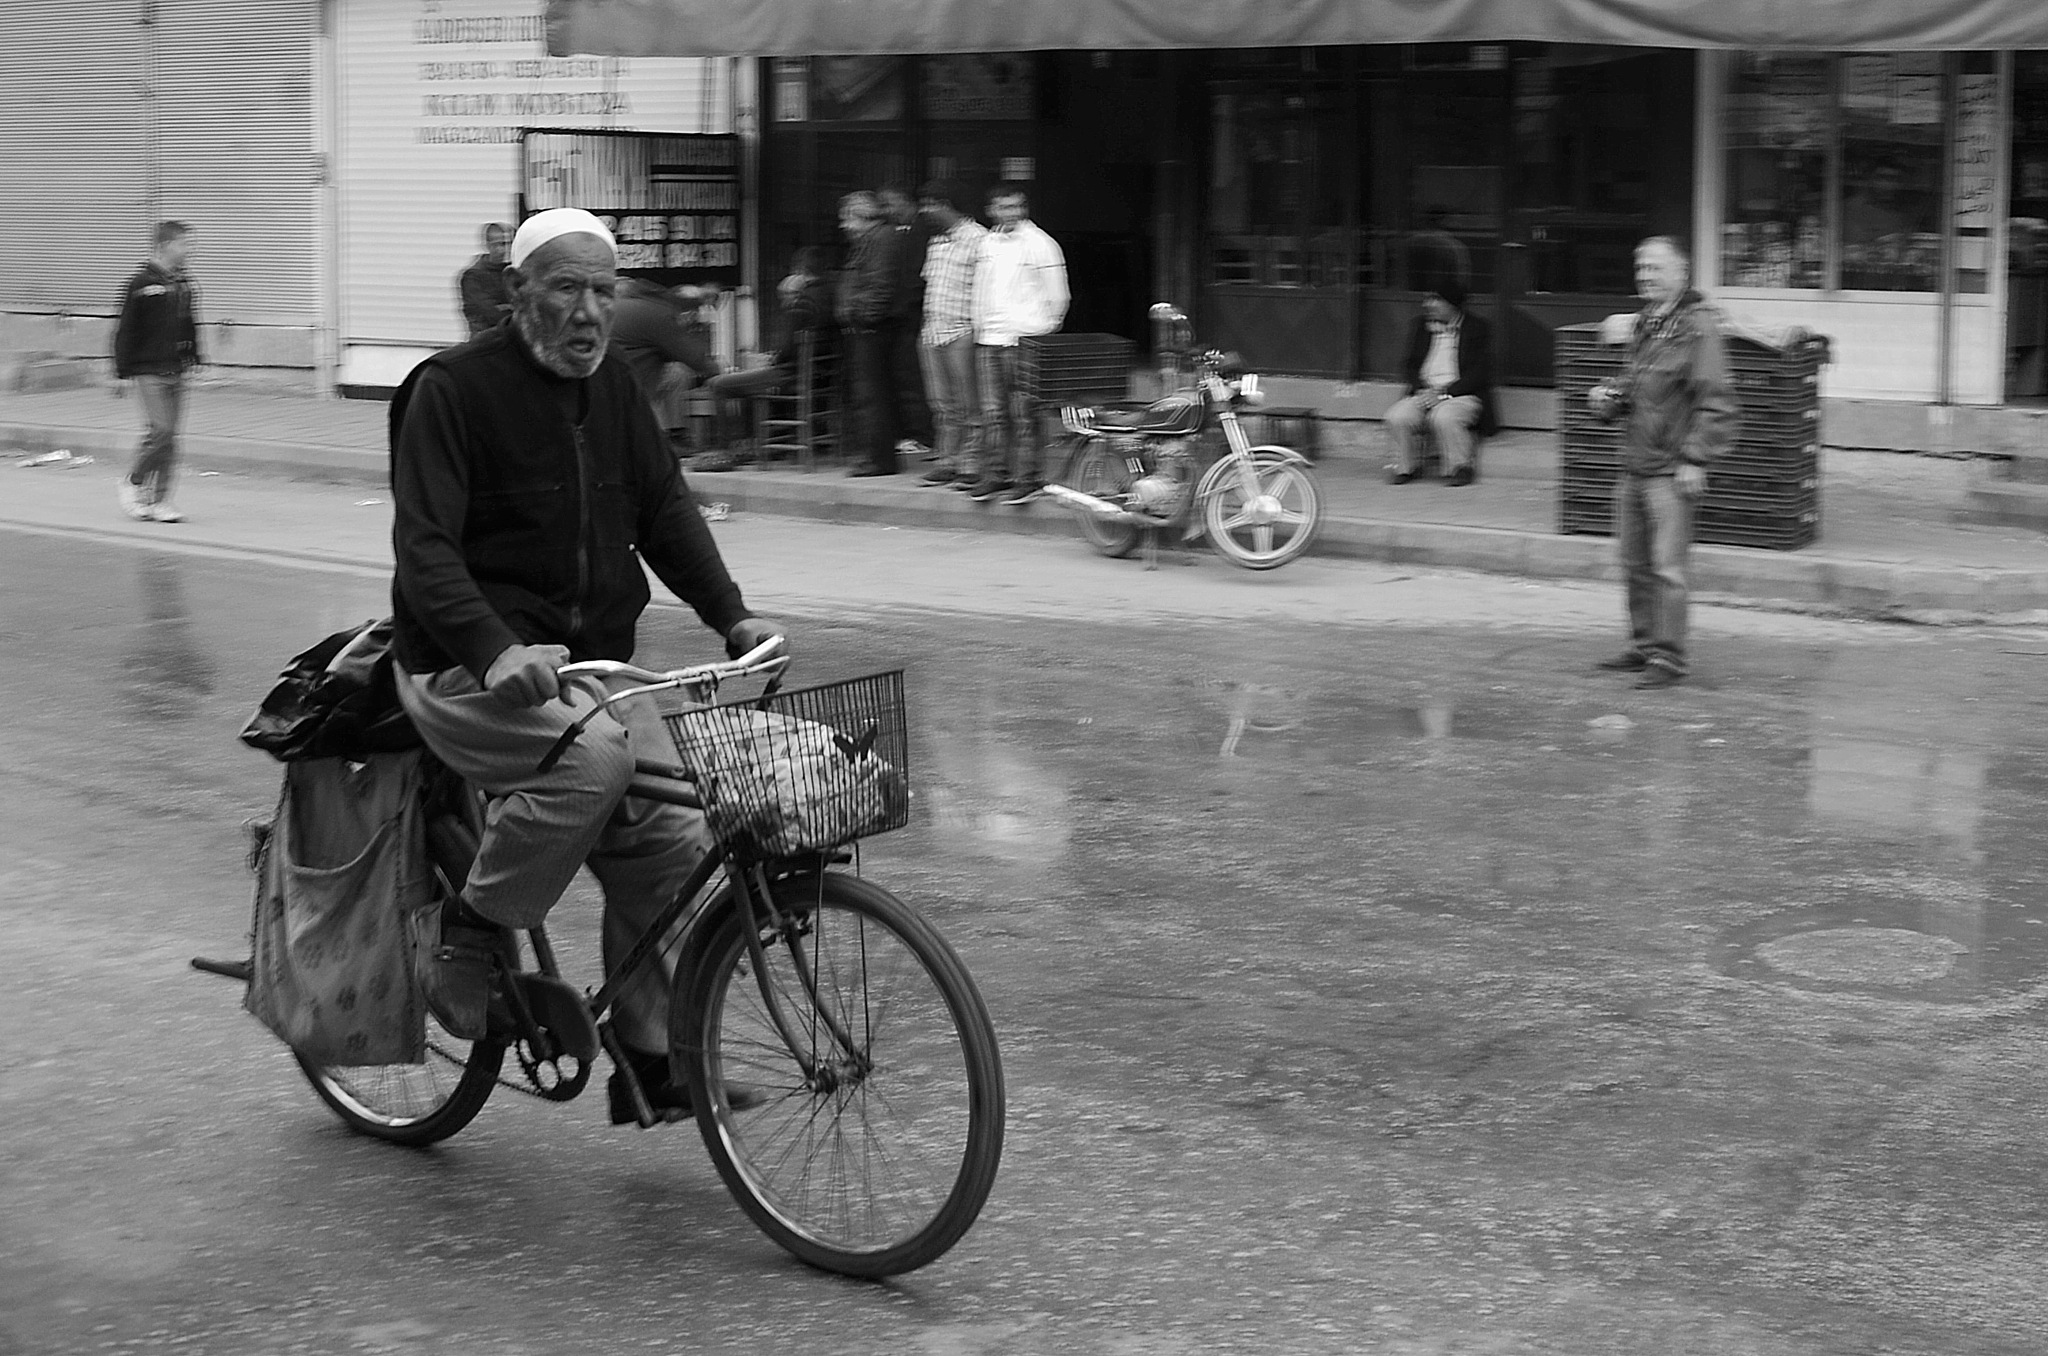 bicycle by Emel Seckin